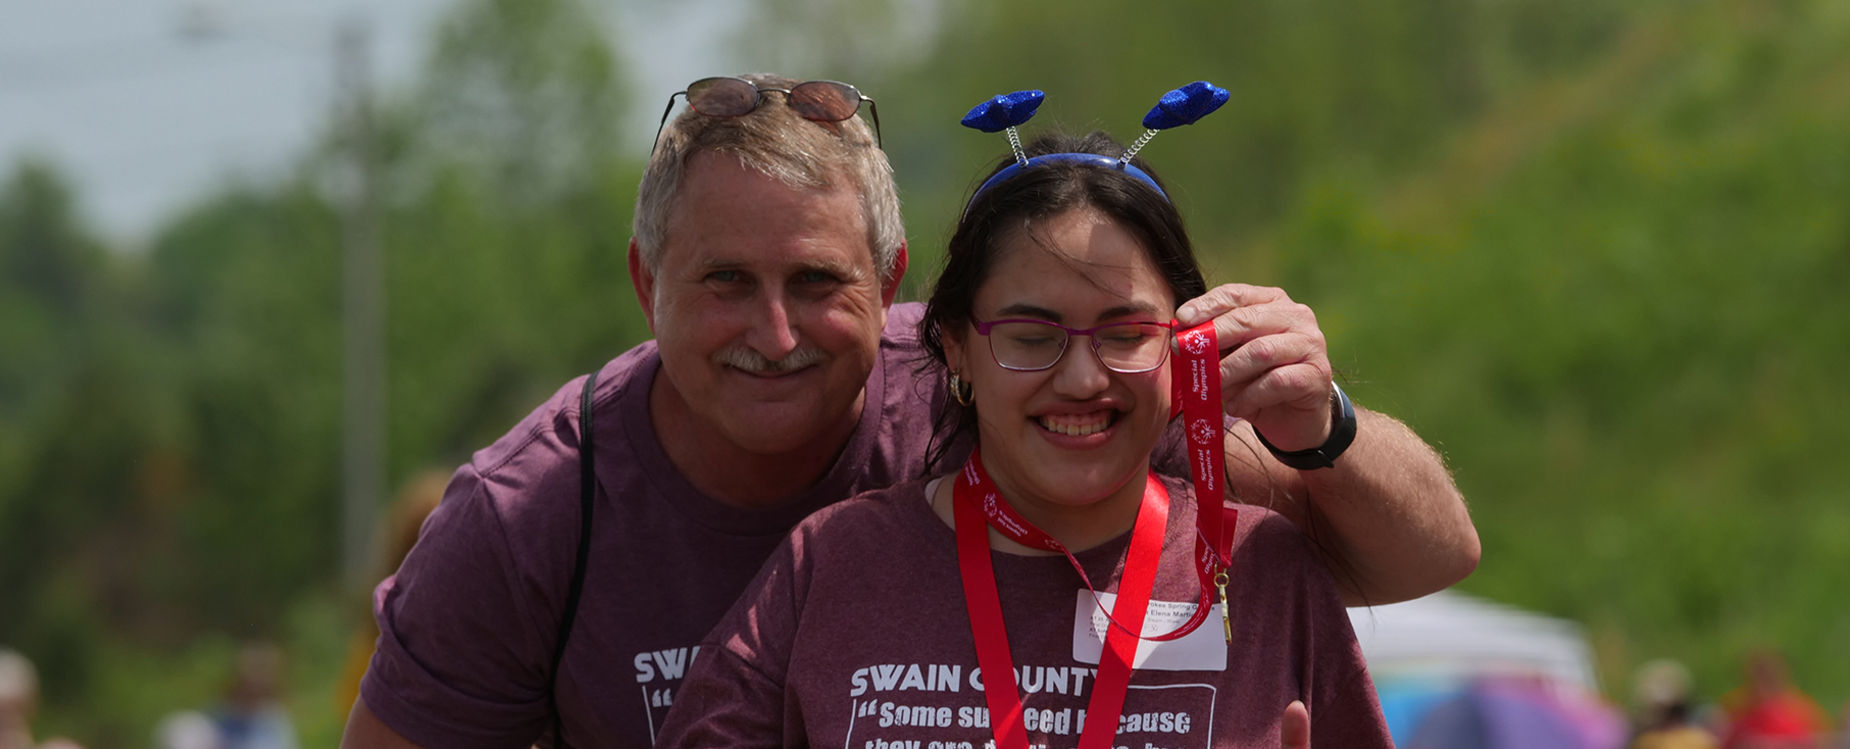 Swain Students at Special Olympics